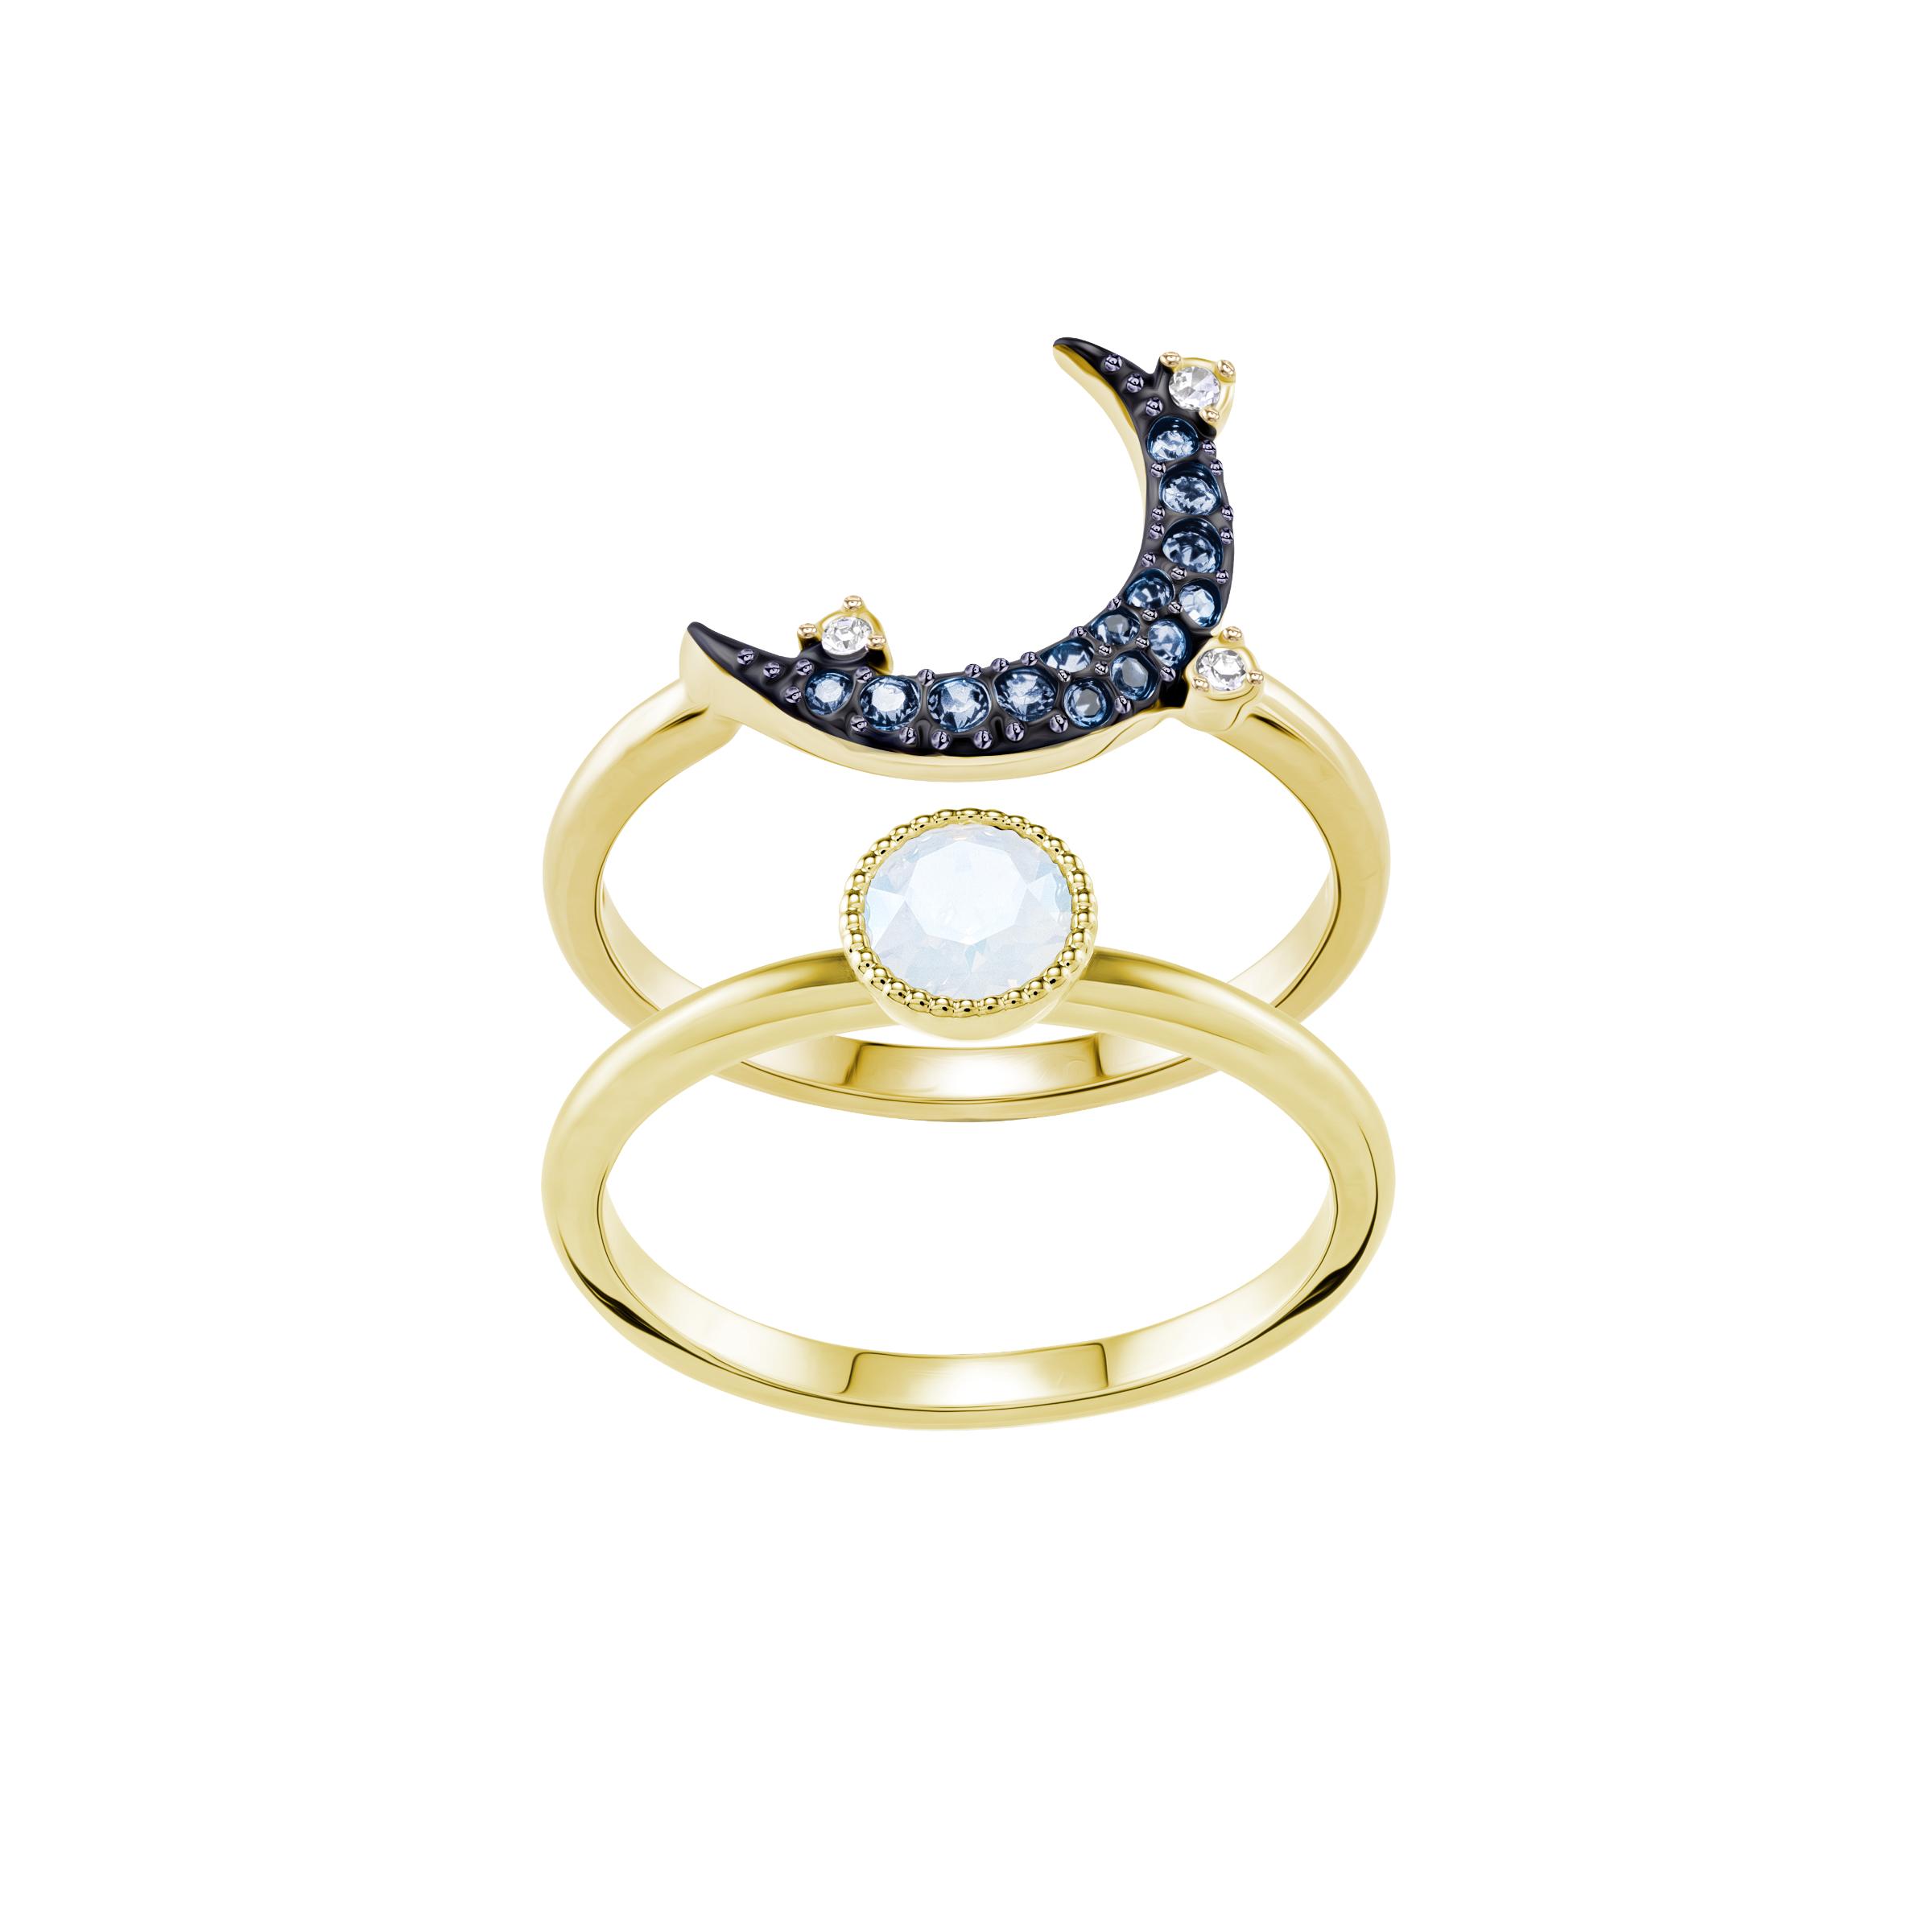 Duo Moon Ring, Teal, Mixed Plating